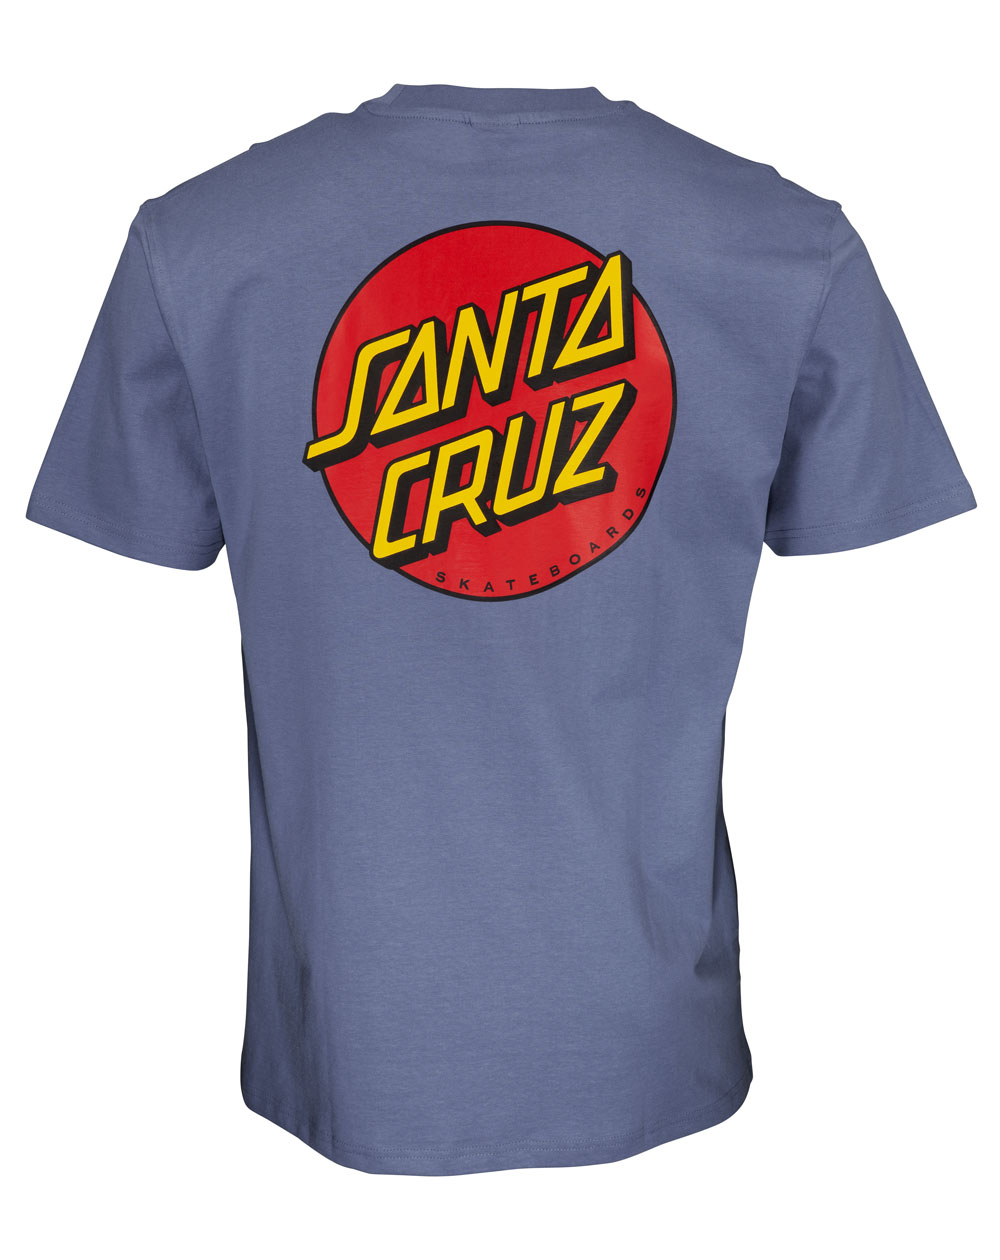 Santa Cruz Men's T-Shirt Classic Dot Chest Washed Navy